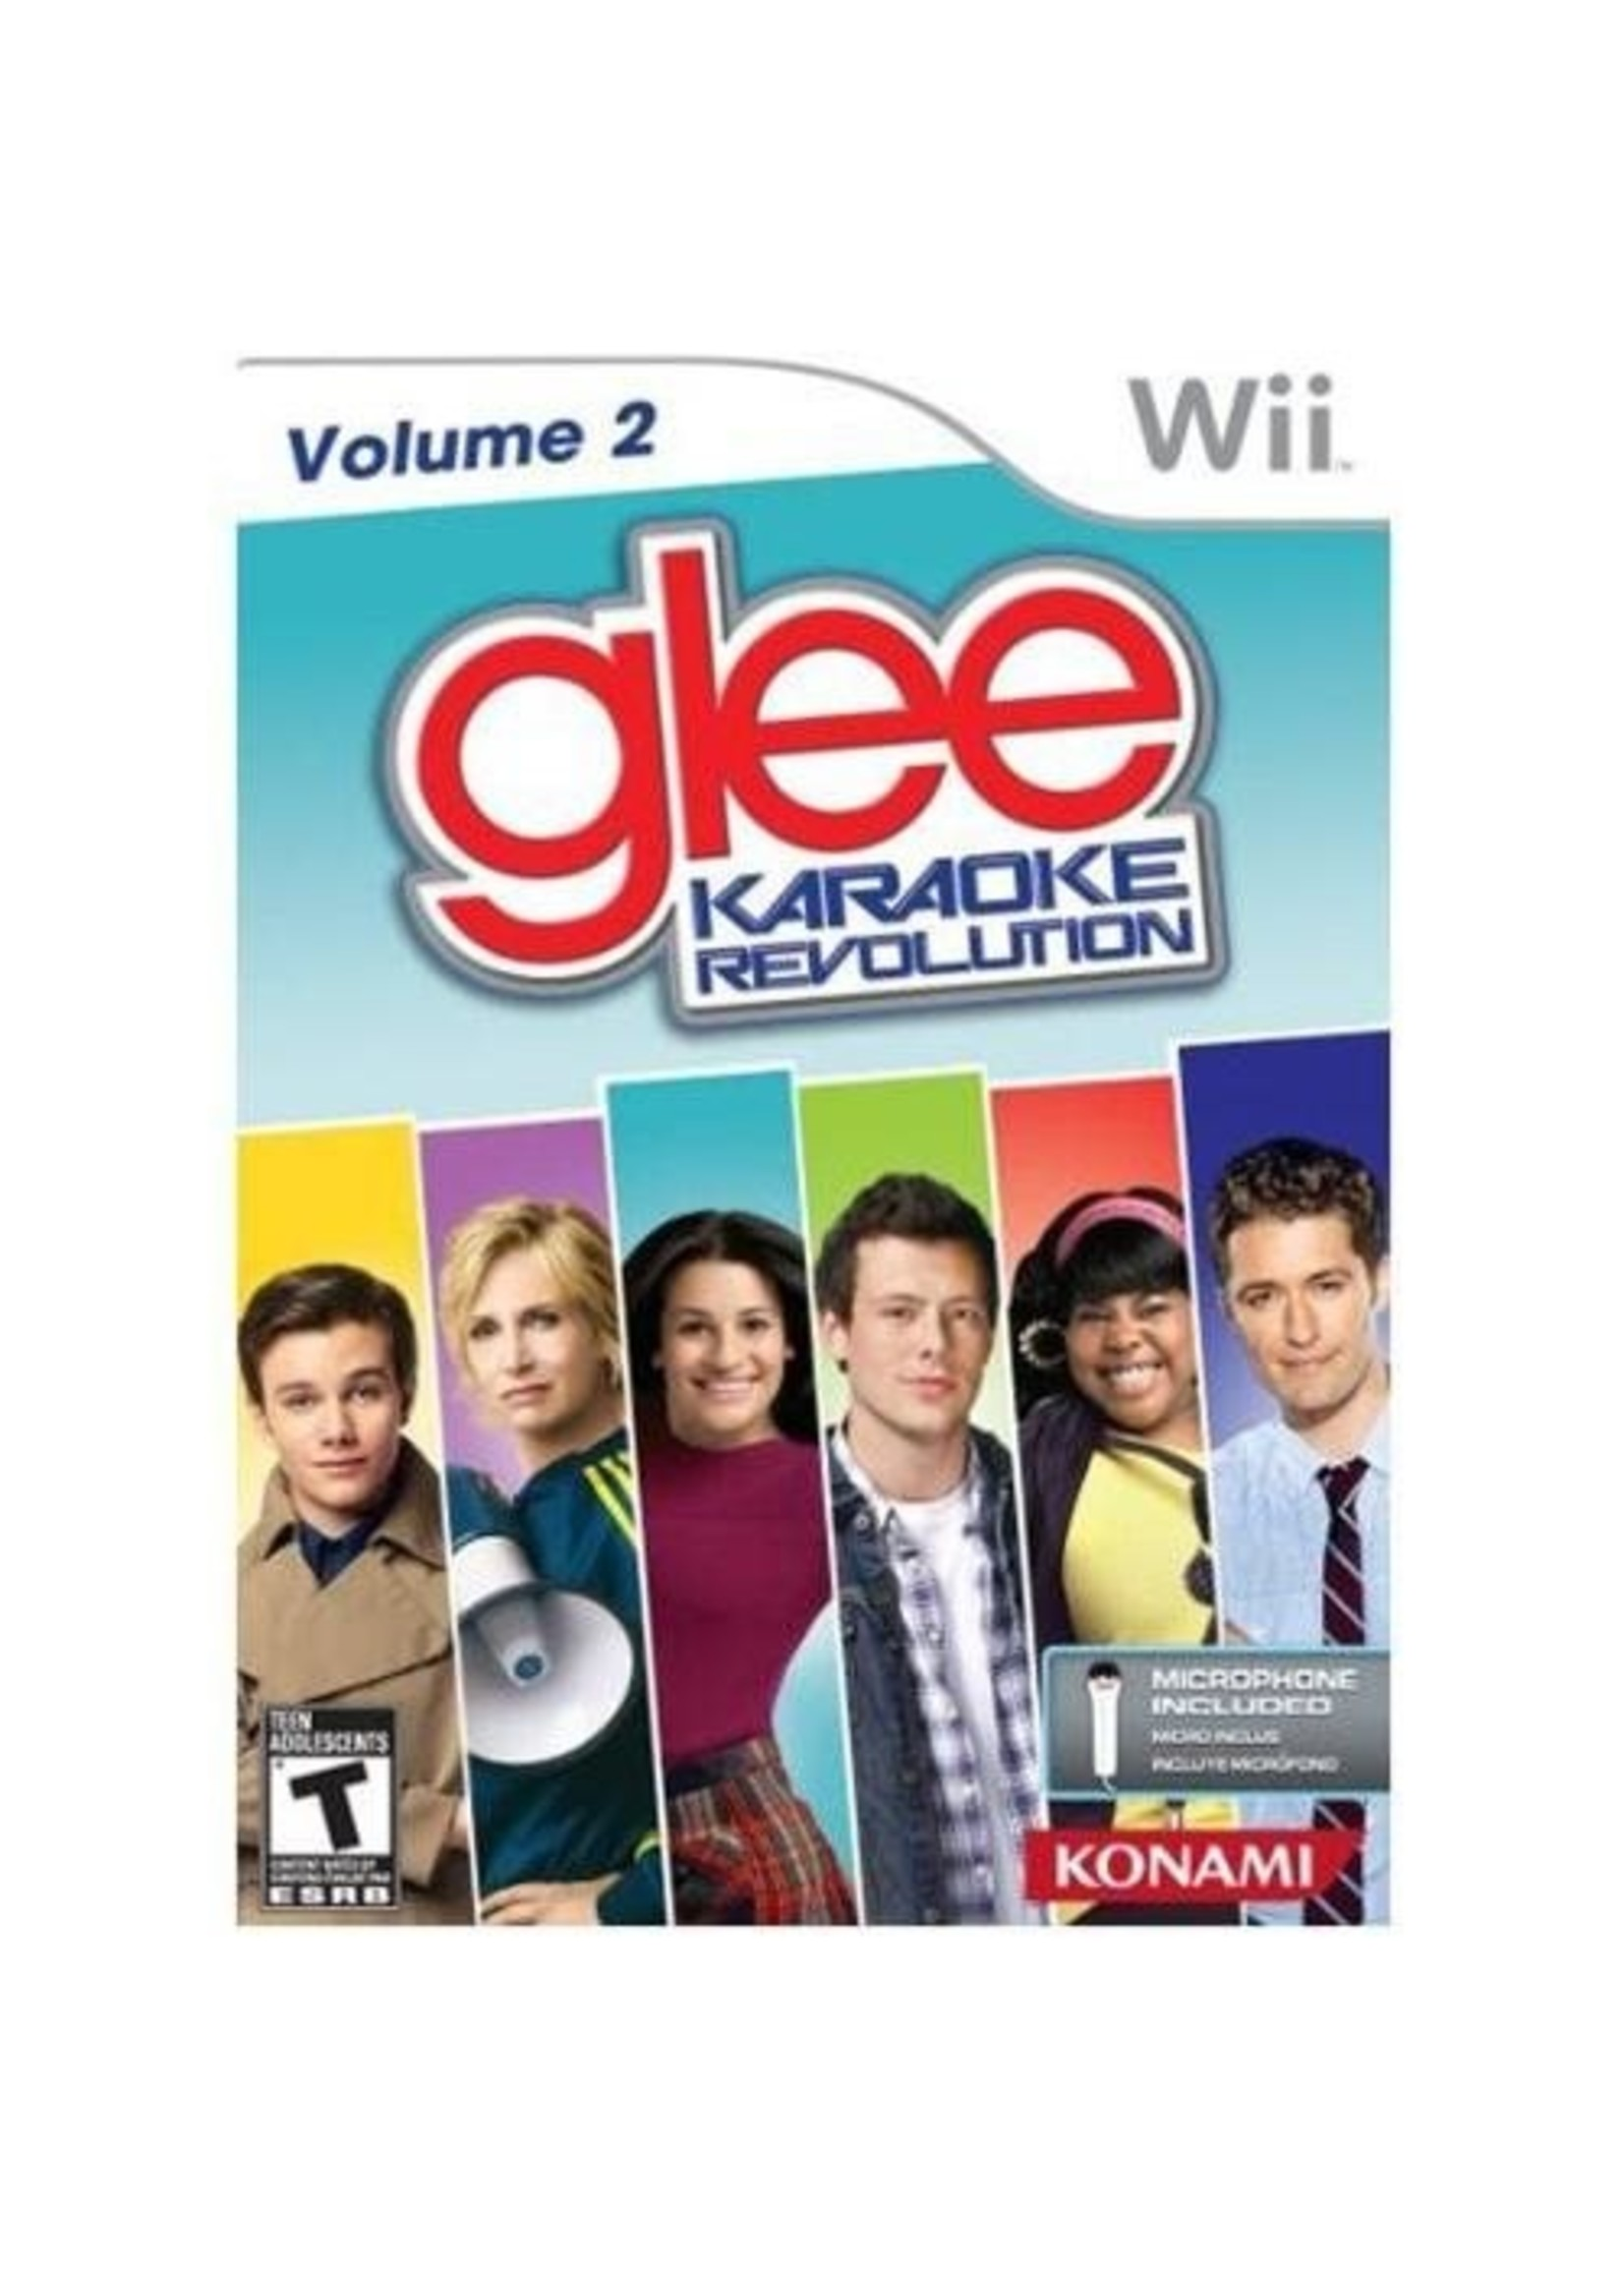 Glee Karaoke Revolution Vol. 2 - Wii PrePlayed